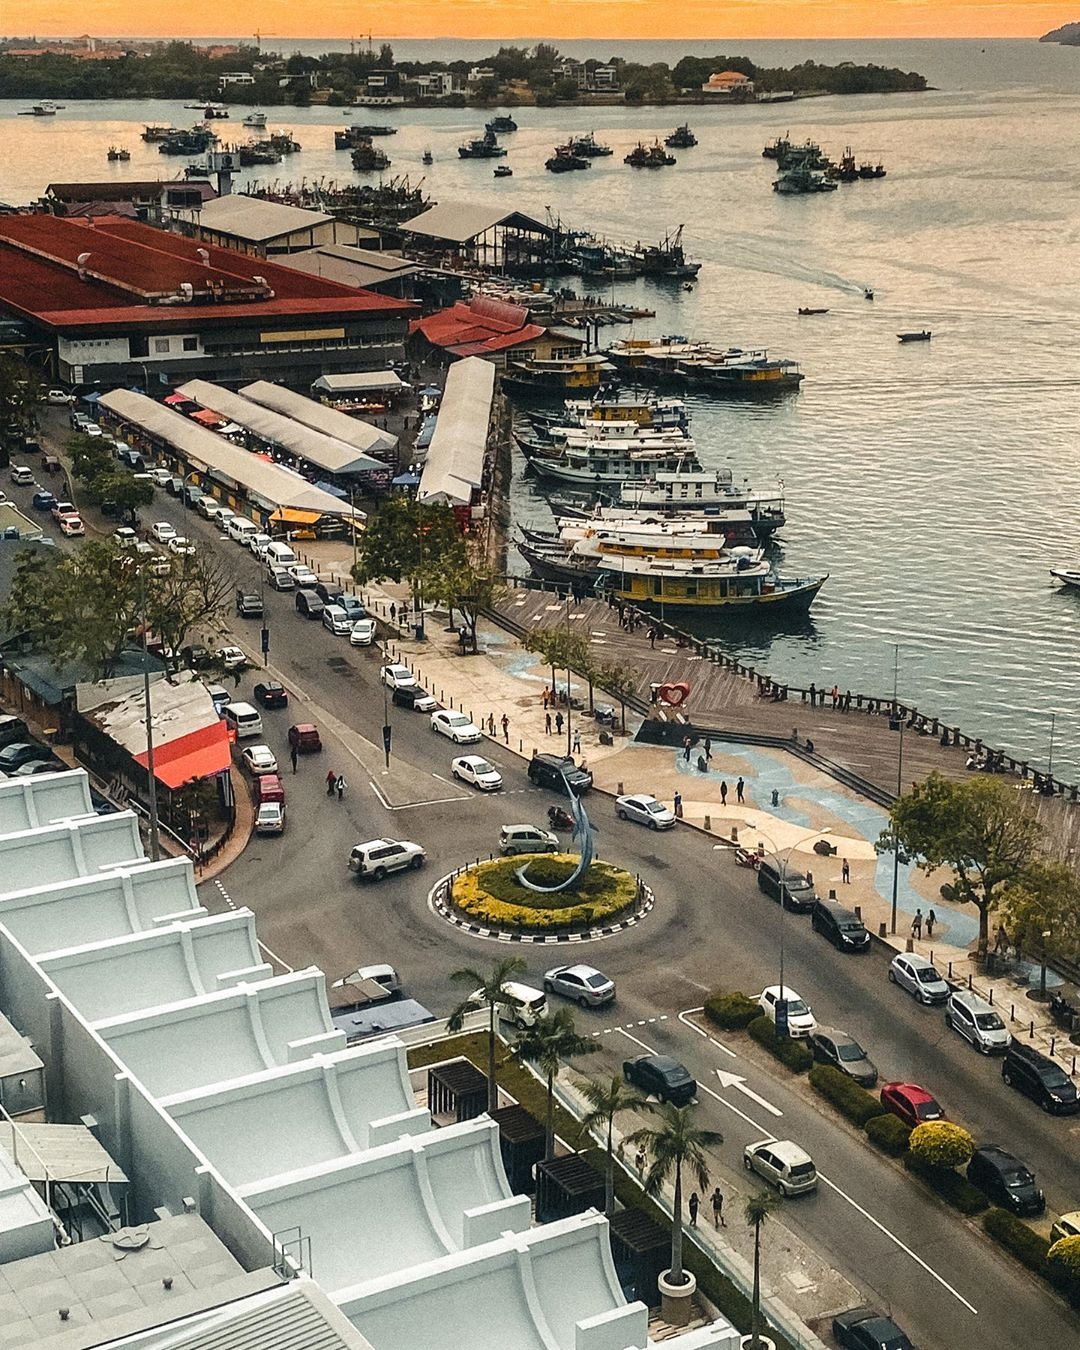 Pinterest-Blog-Tempat-Menarik-Di-Sabah-1-1244423136-1080x1350